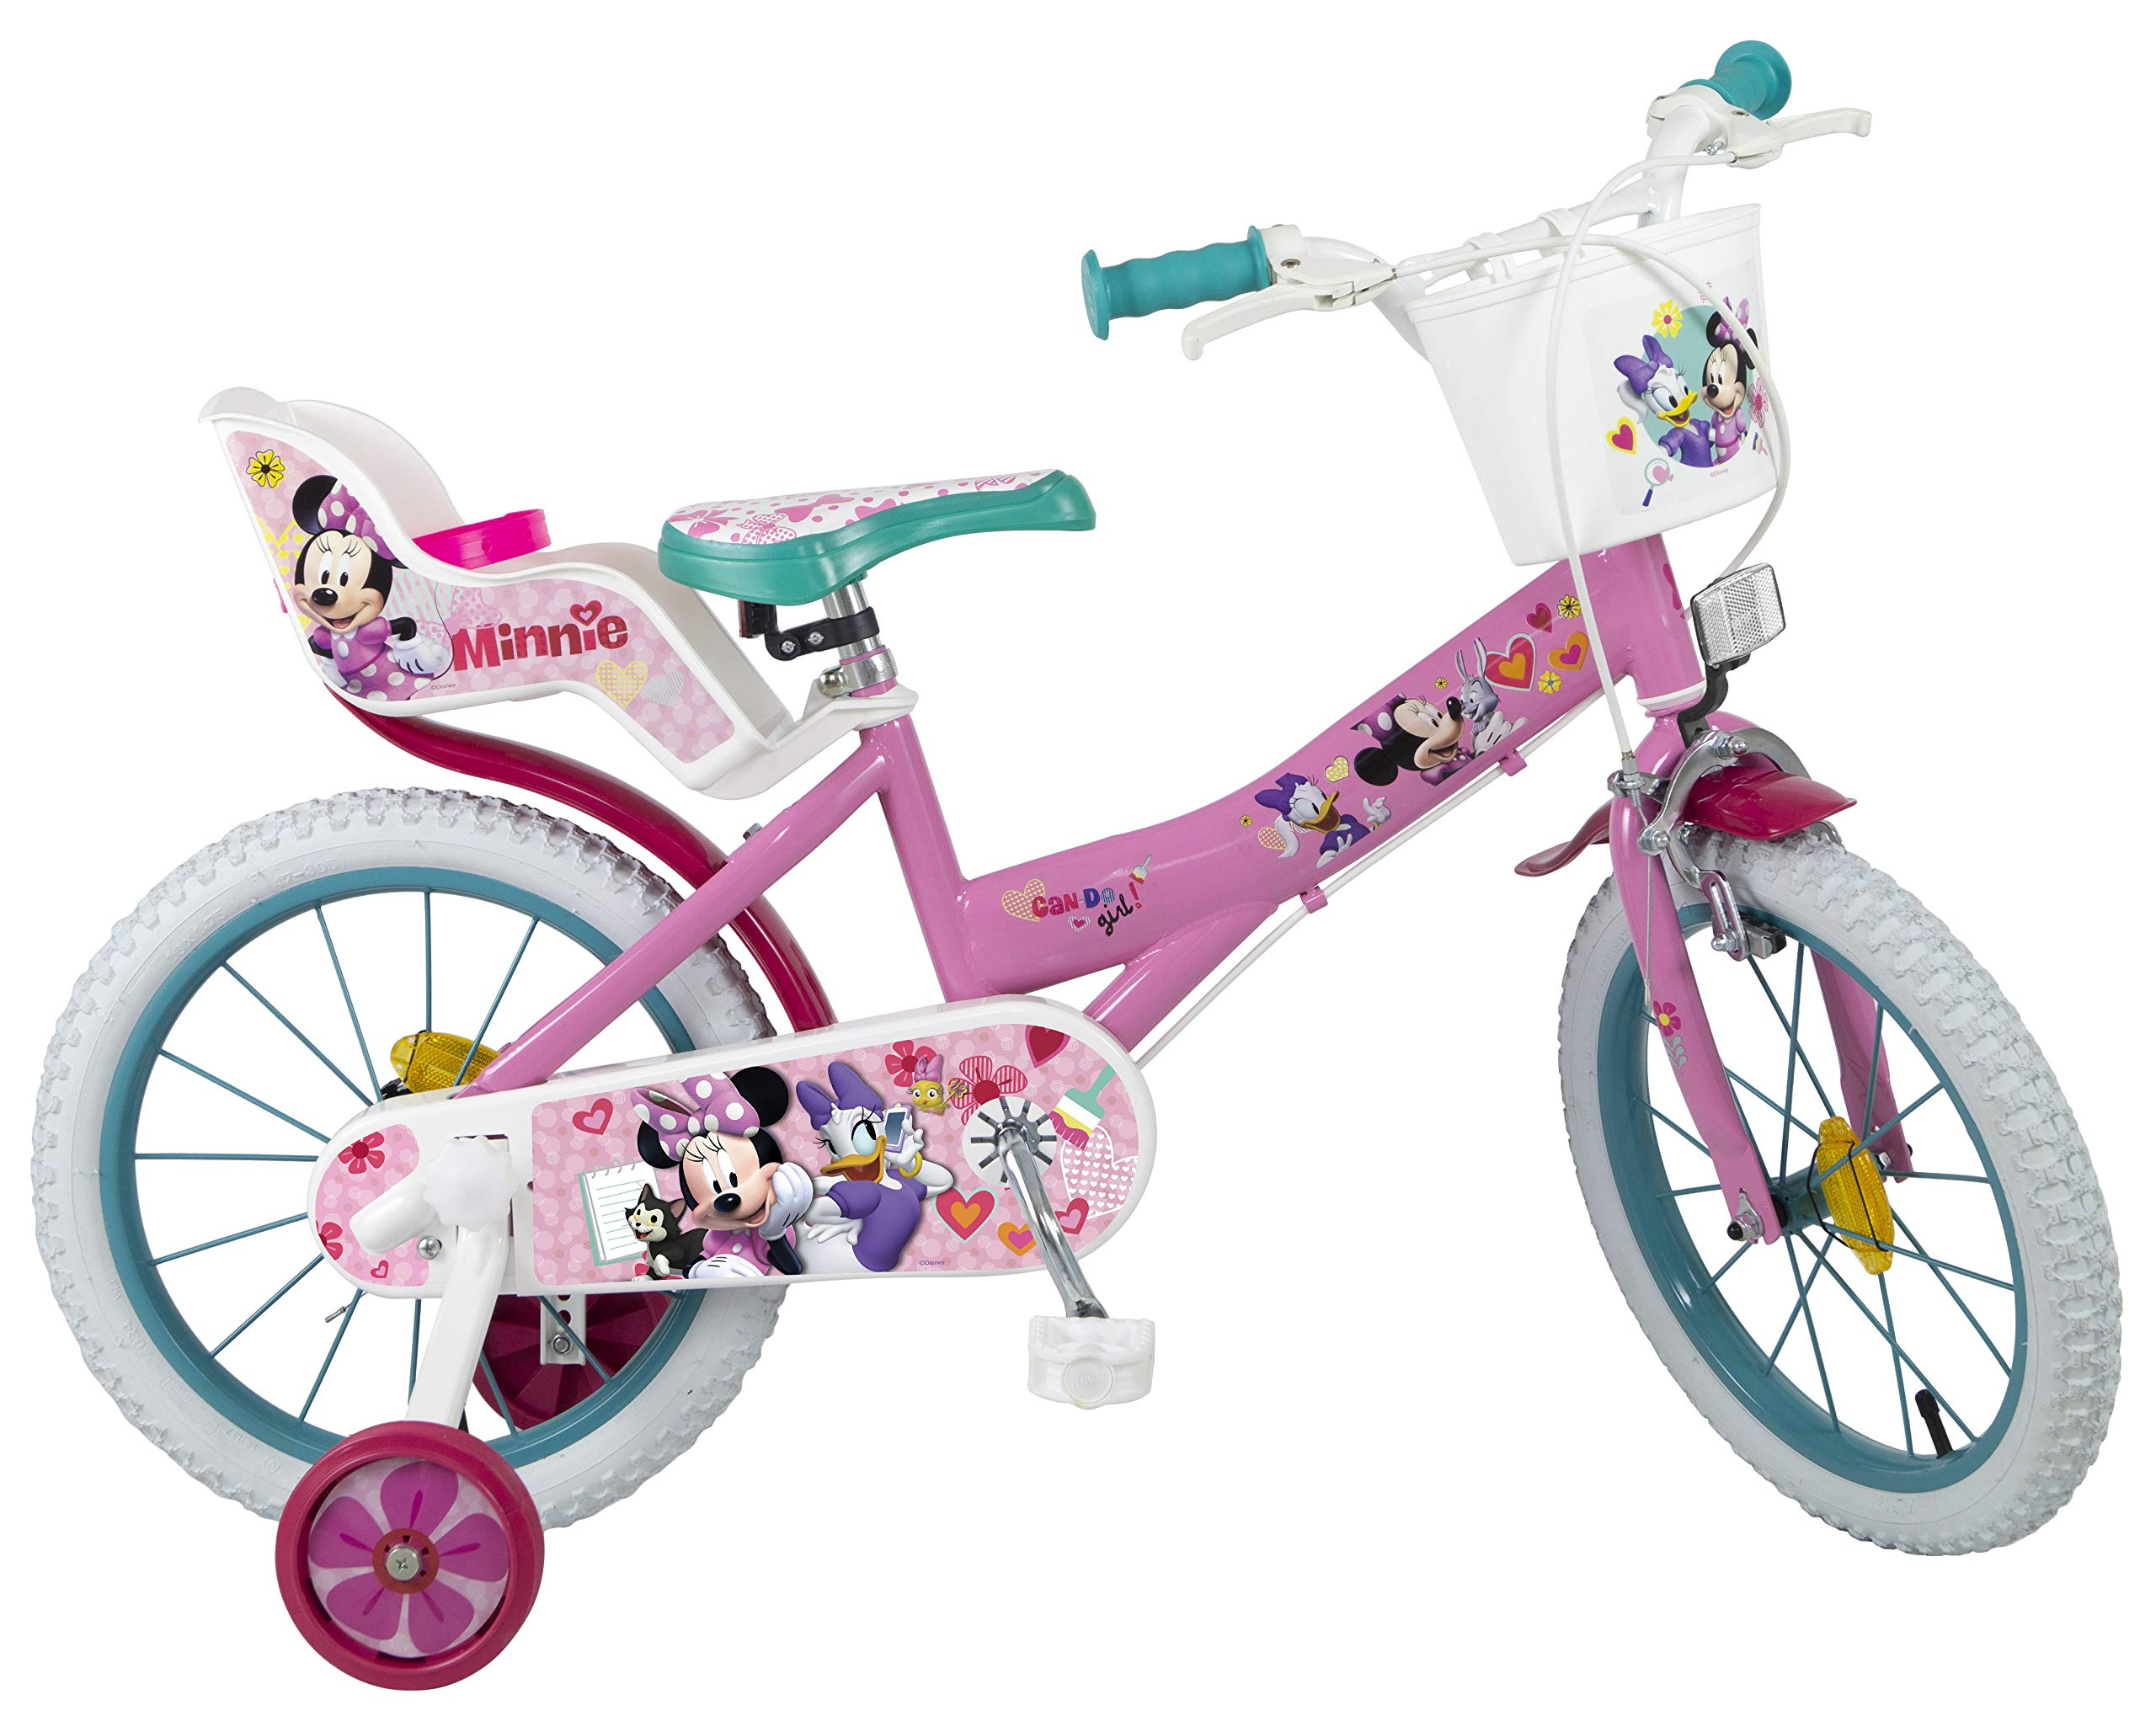 TOIMSA Niños Minnie – Bicicleta Infantil, Color Rosa, 16 Pulgadas ...